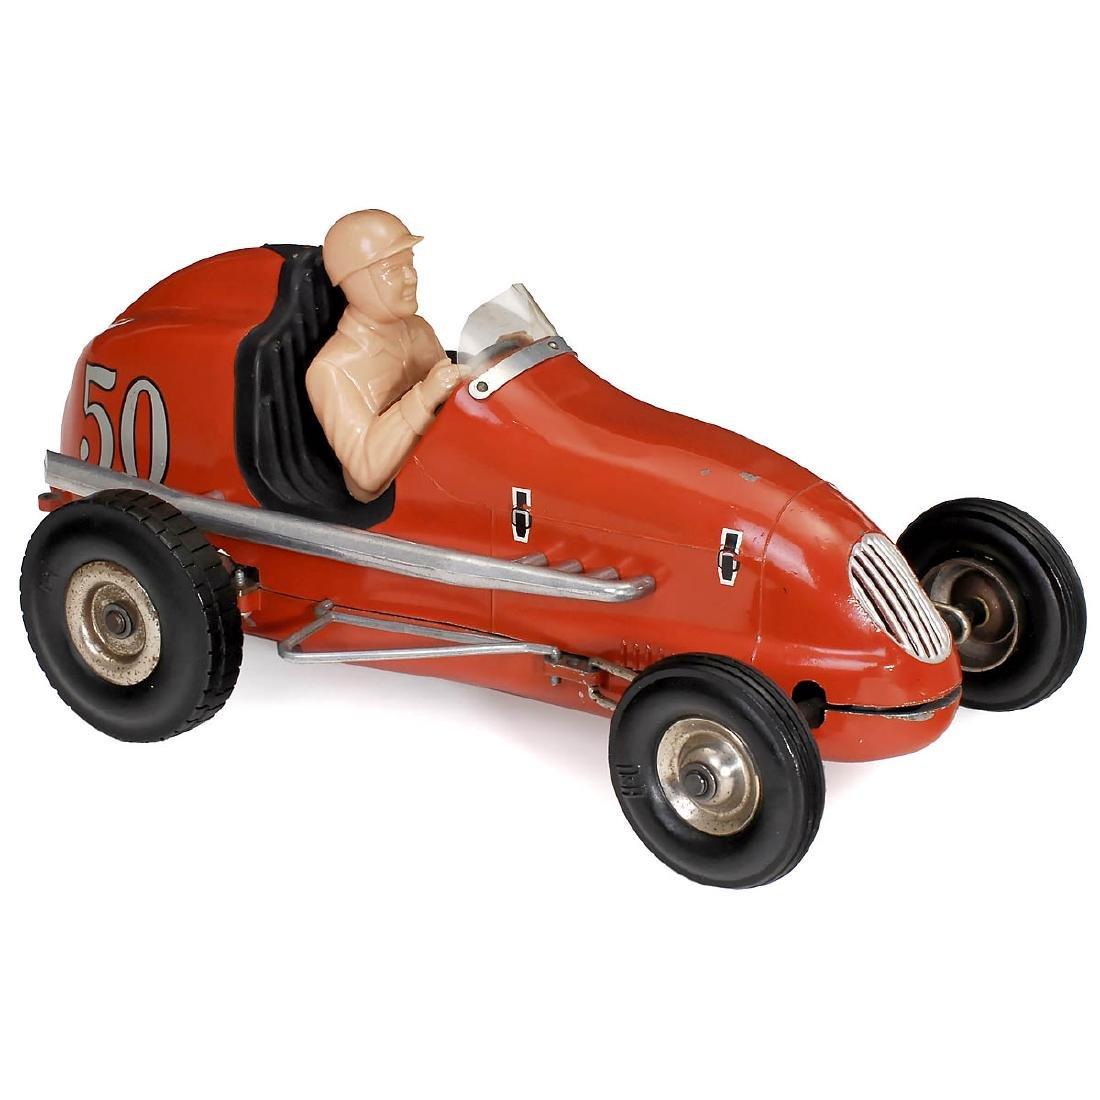 Ohlsson & Rice Gas-Powered Racing Car, c. 1960